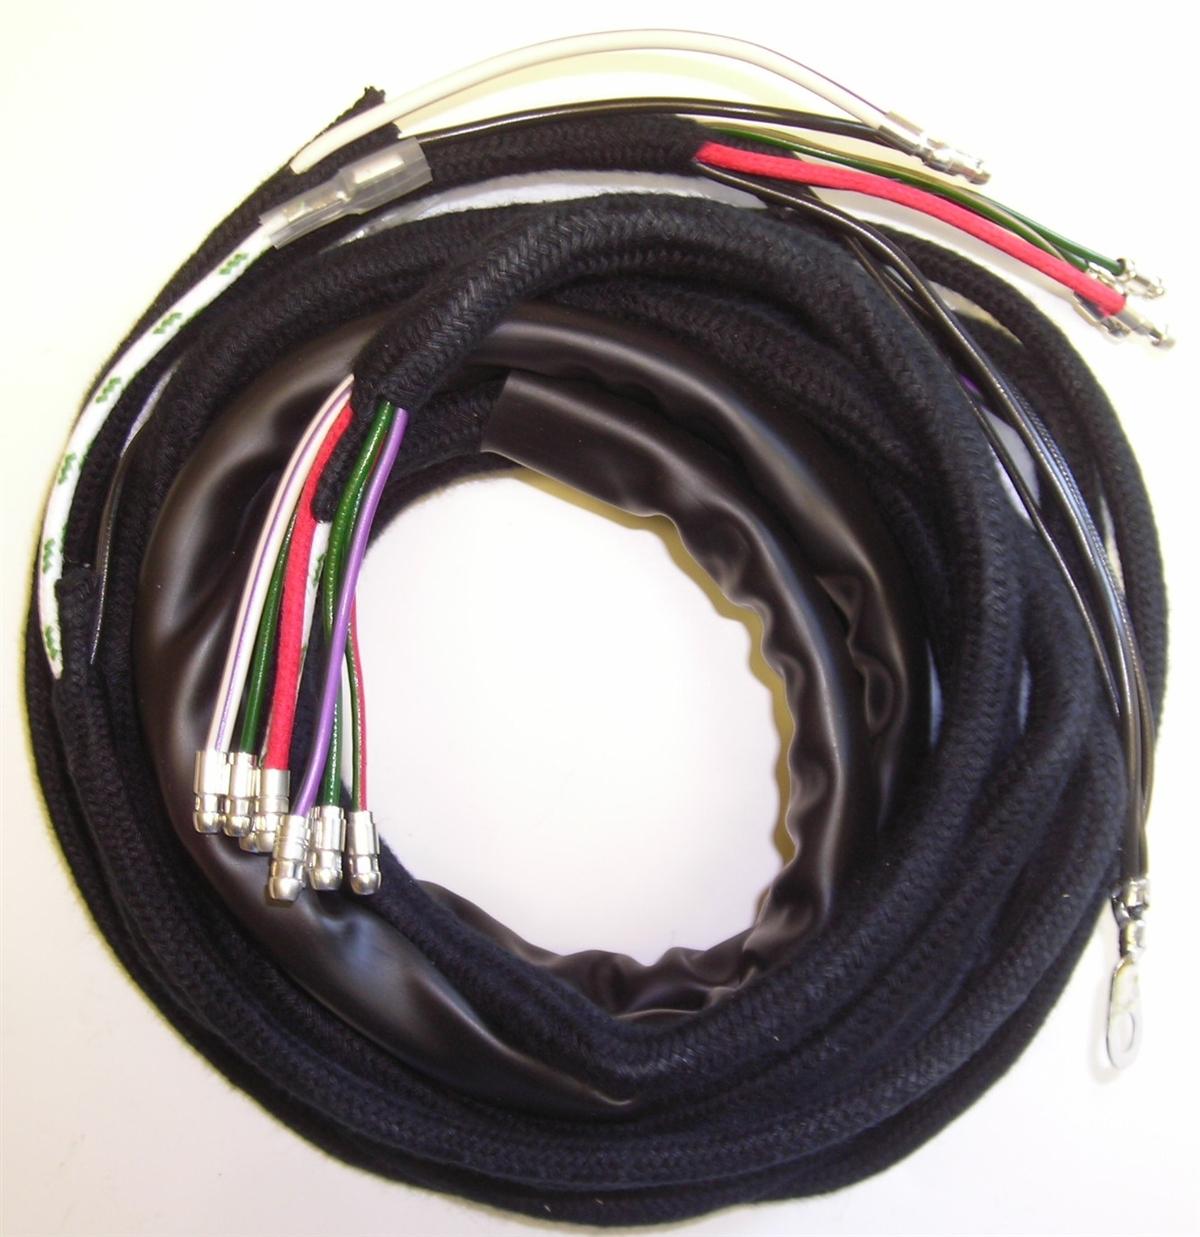 lh body wiring harness for 3 8 liter xke\u0027s (122) Jaguar XJ